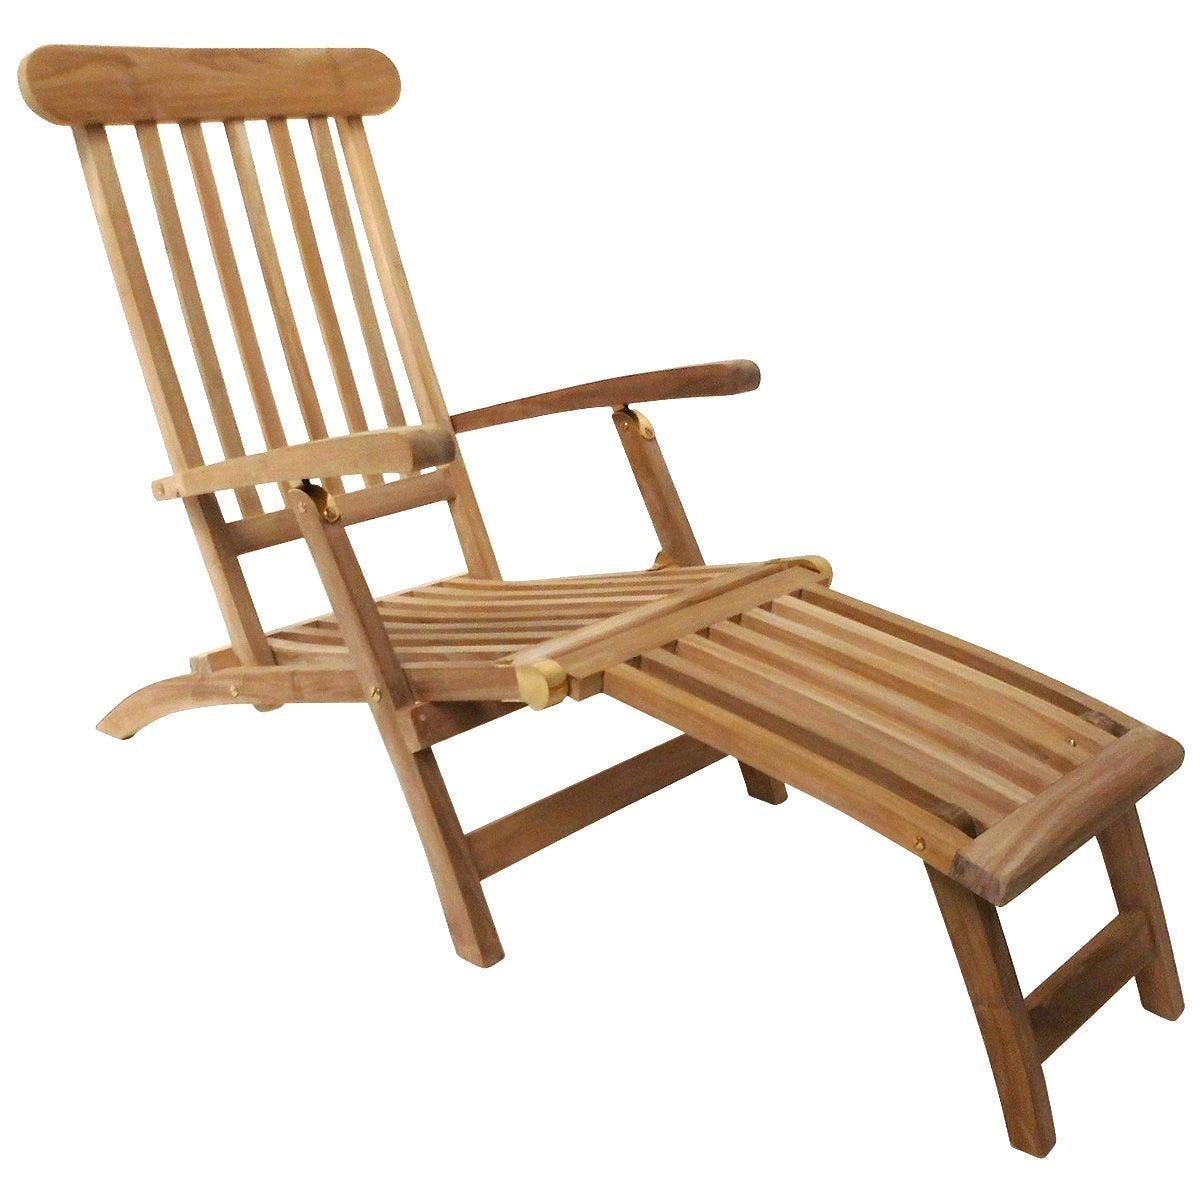 Charles Bentley Wooden Steamer Chair